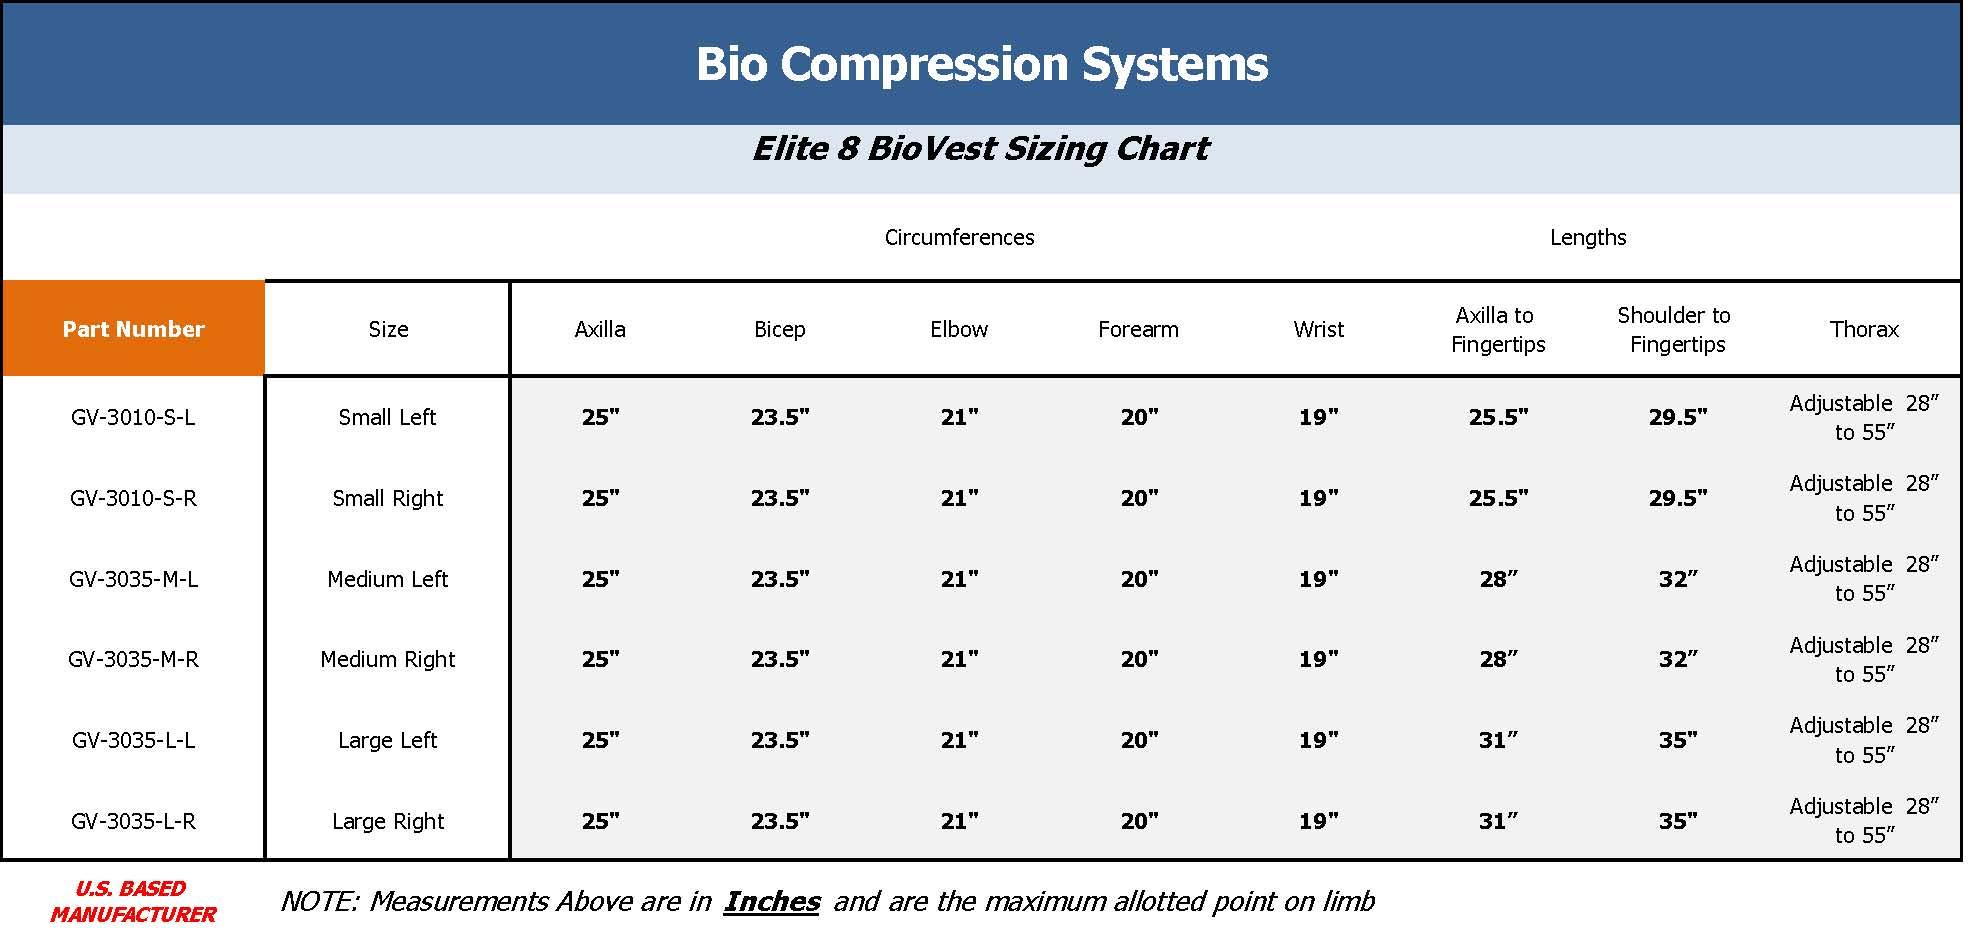 bcs-sizingchart-biovest-in.jpg